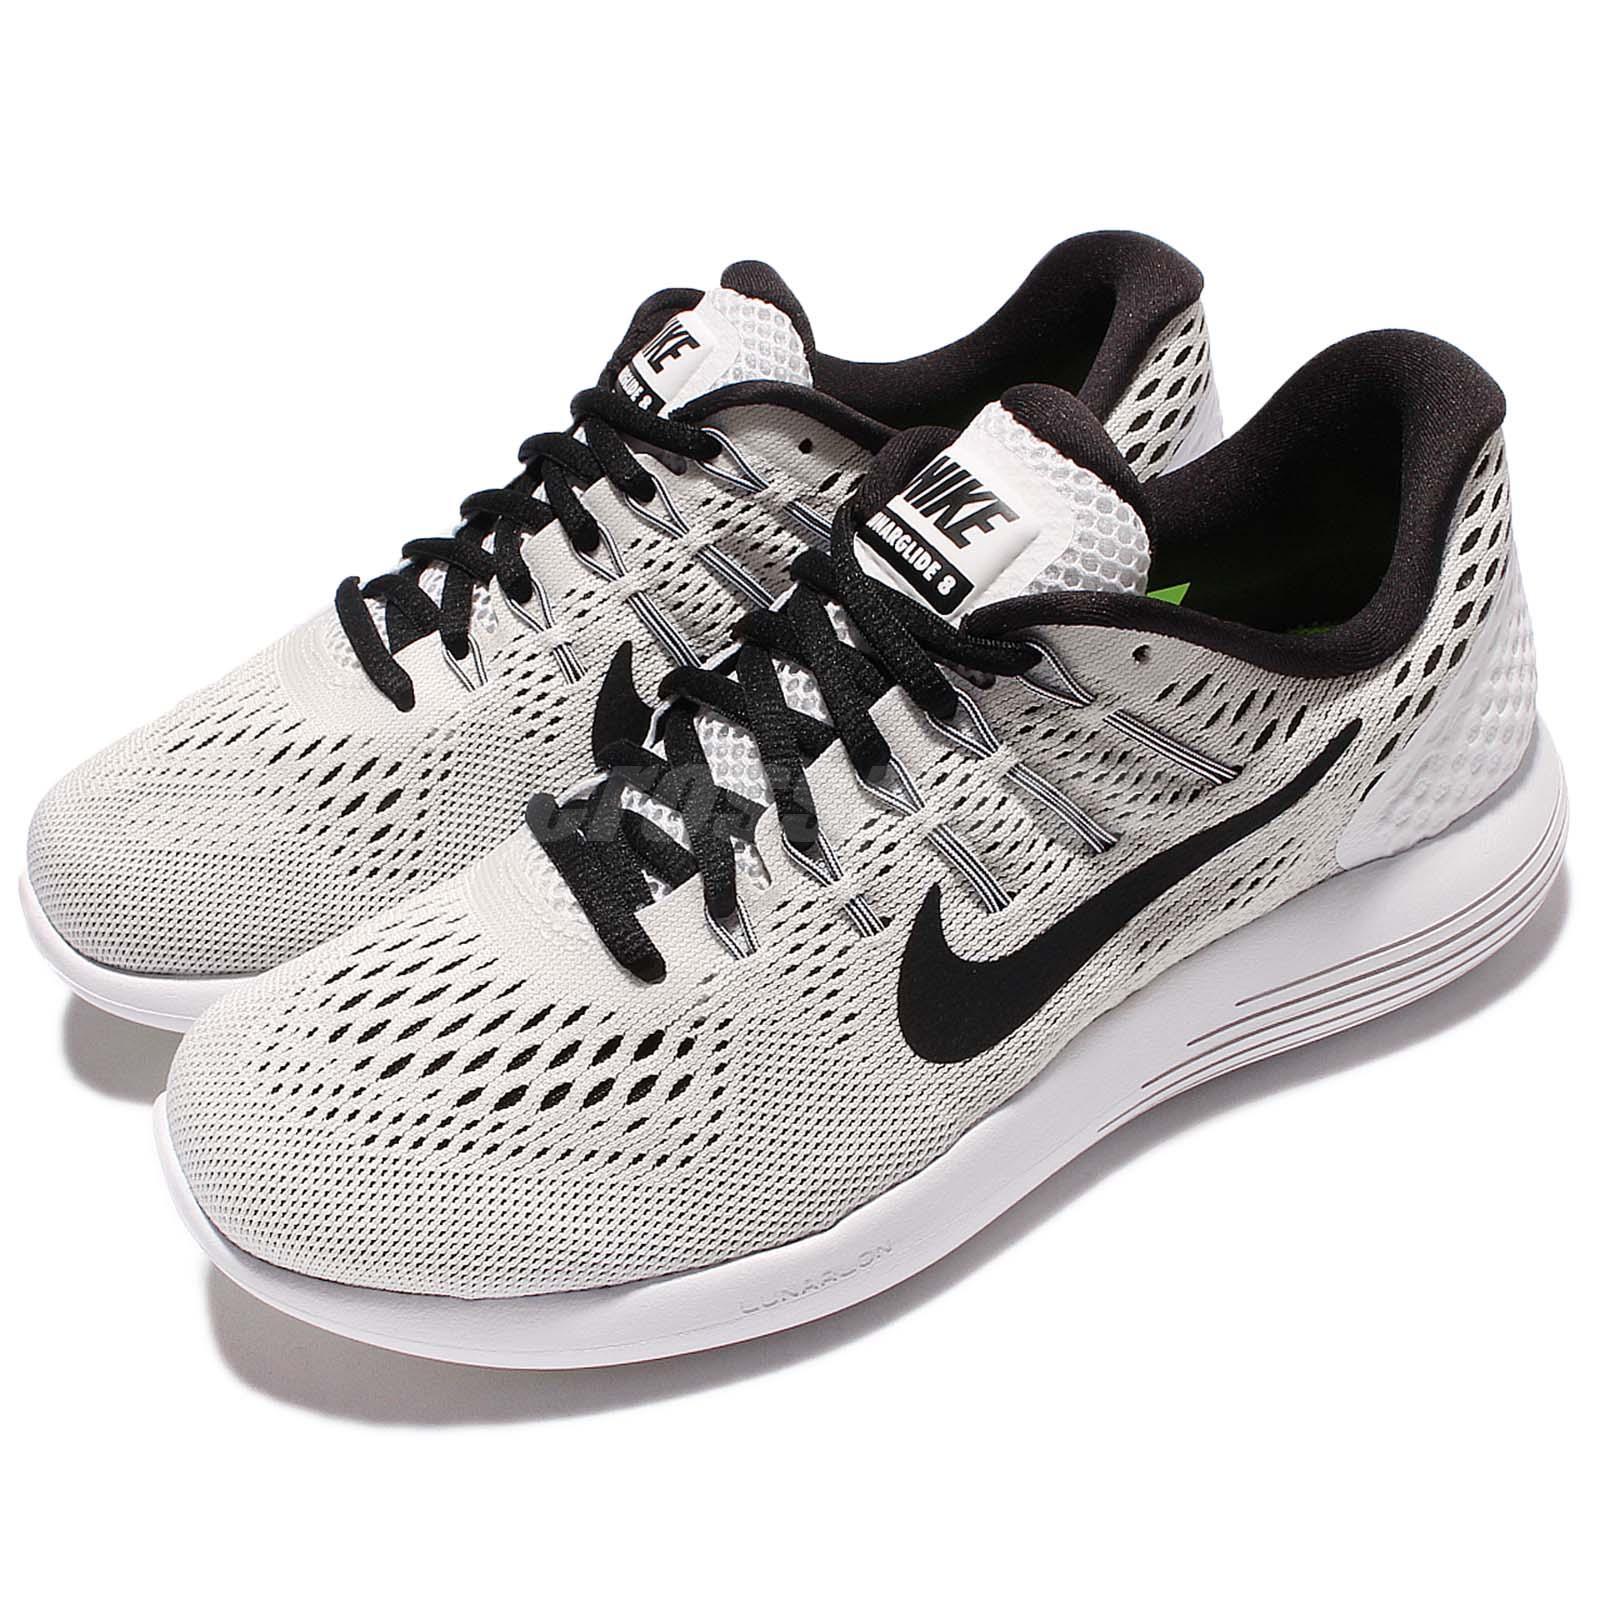 b4374d4a43f8 Nike Wmns Lunarglide 8 VIII White Black Women Running Shoes Sneakers ...